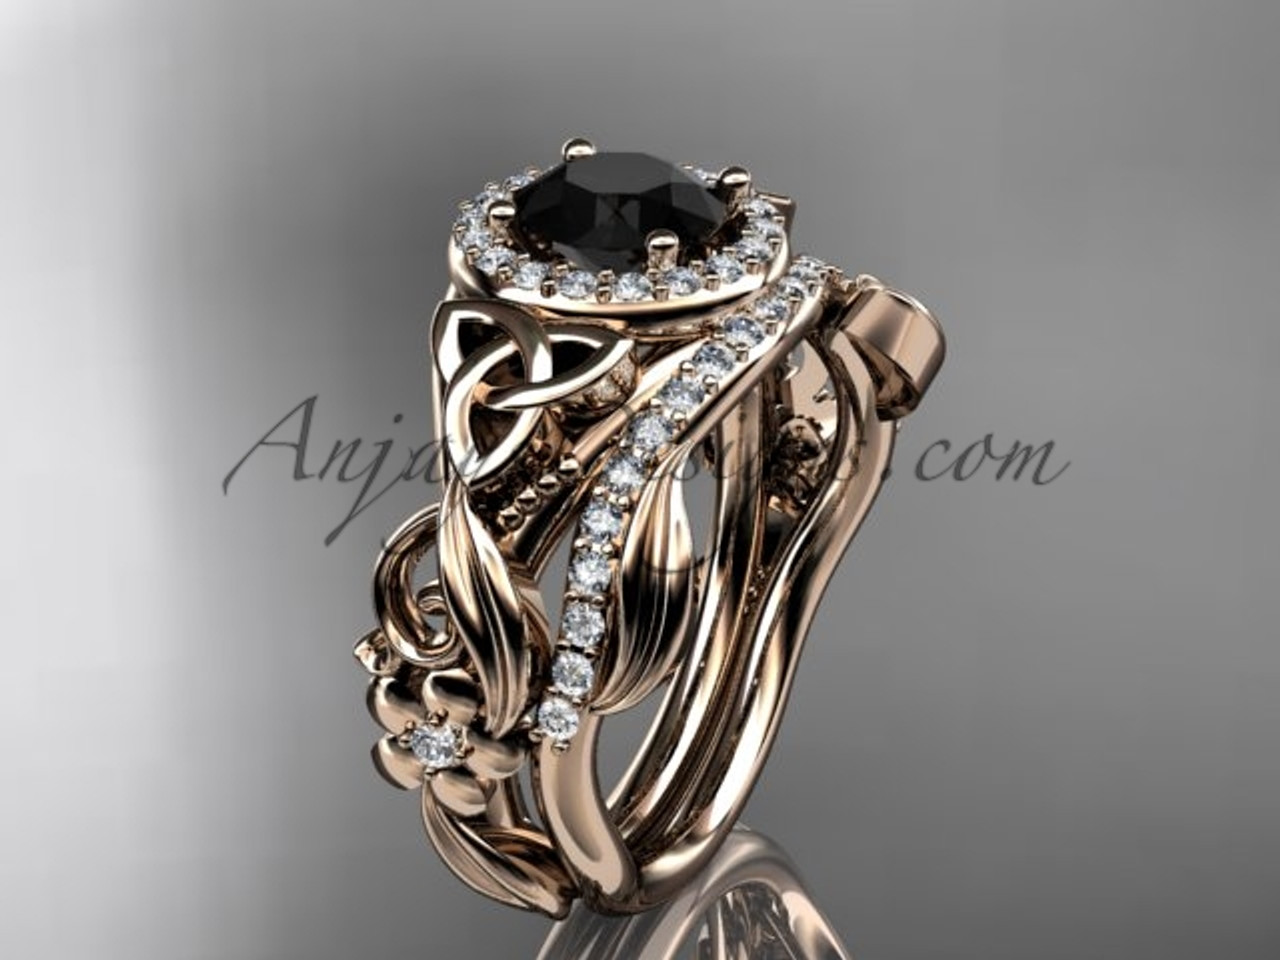 black diamond celtic wedding ring sets rose gold ring ct7300s - Rose Gold Diamond Wedding Ring